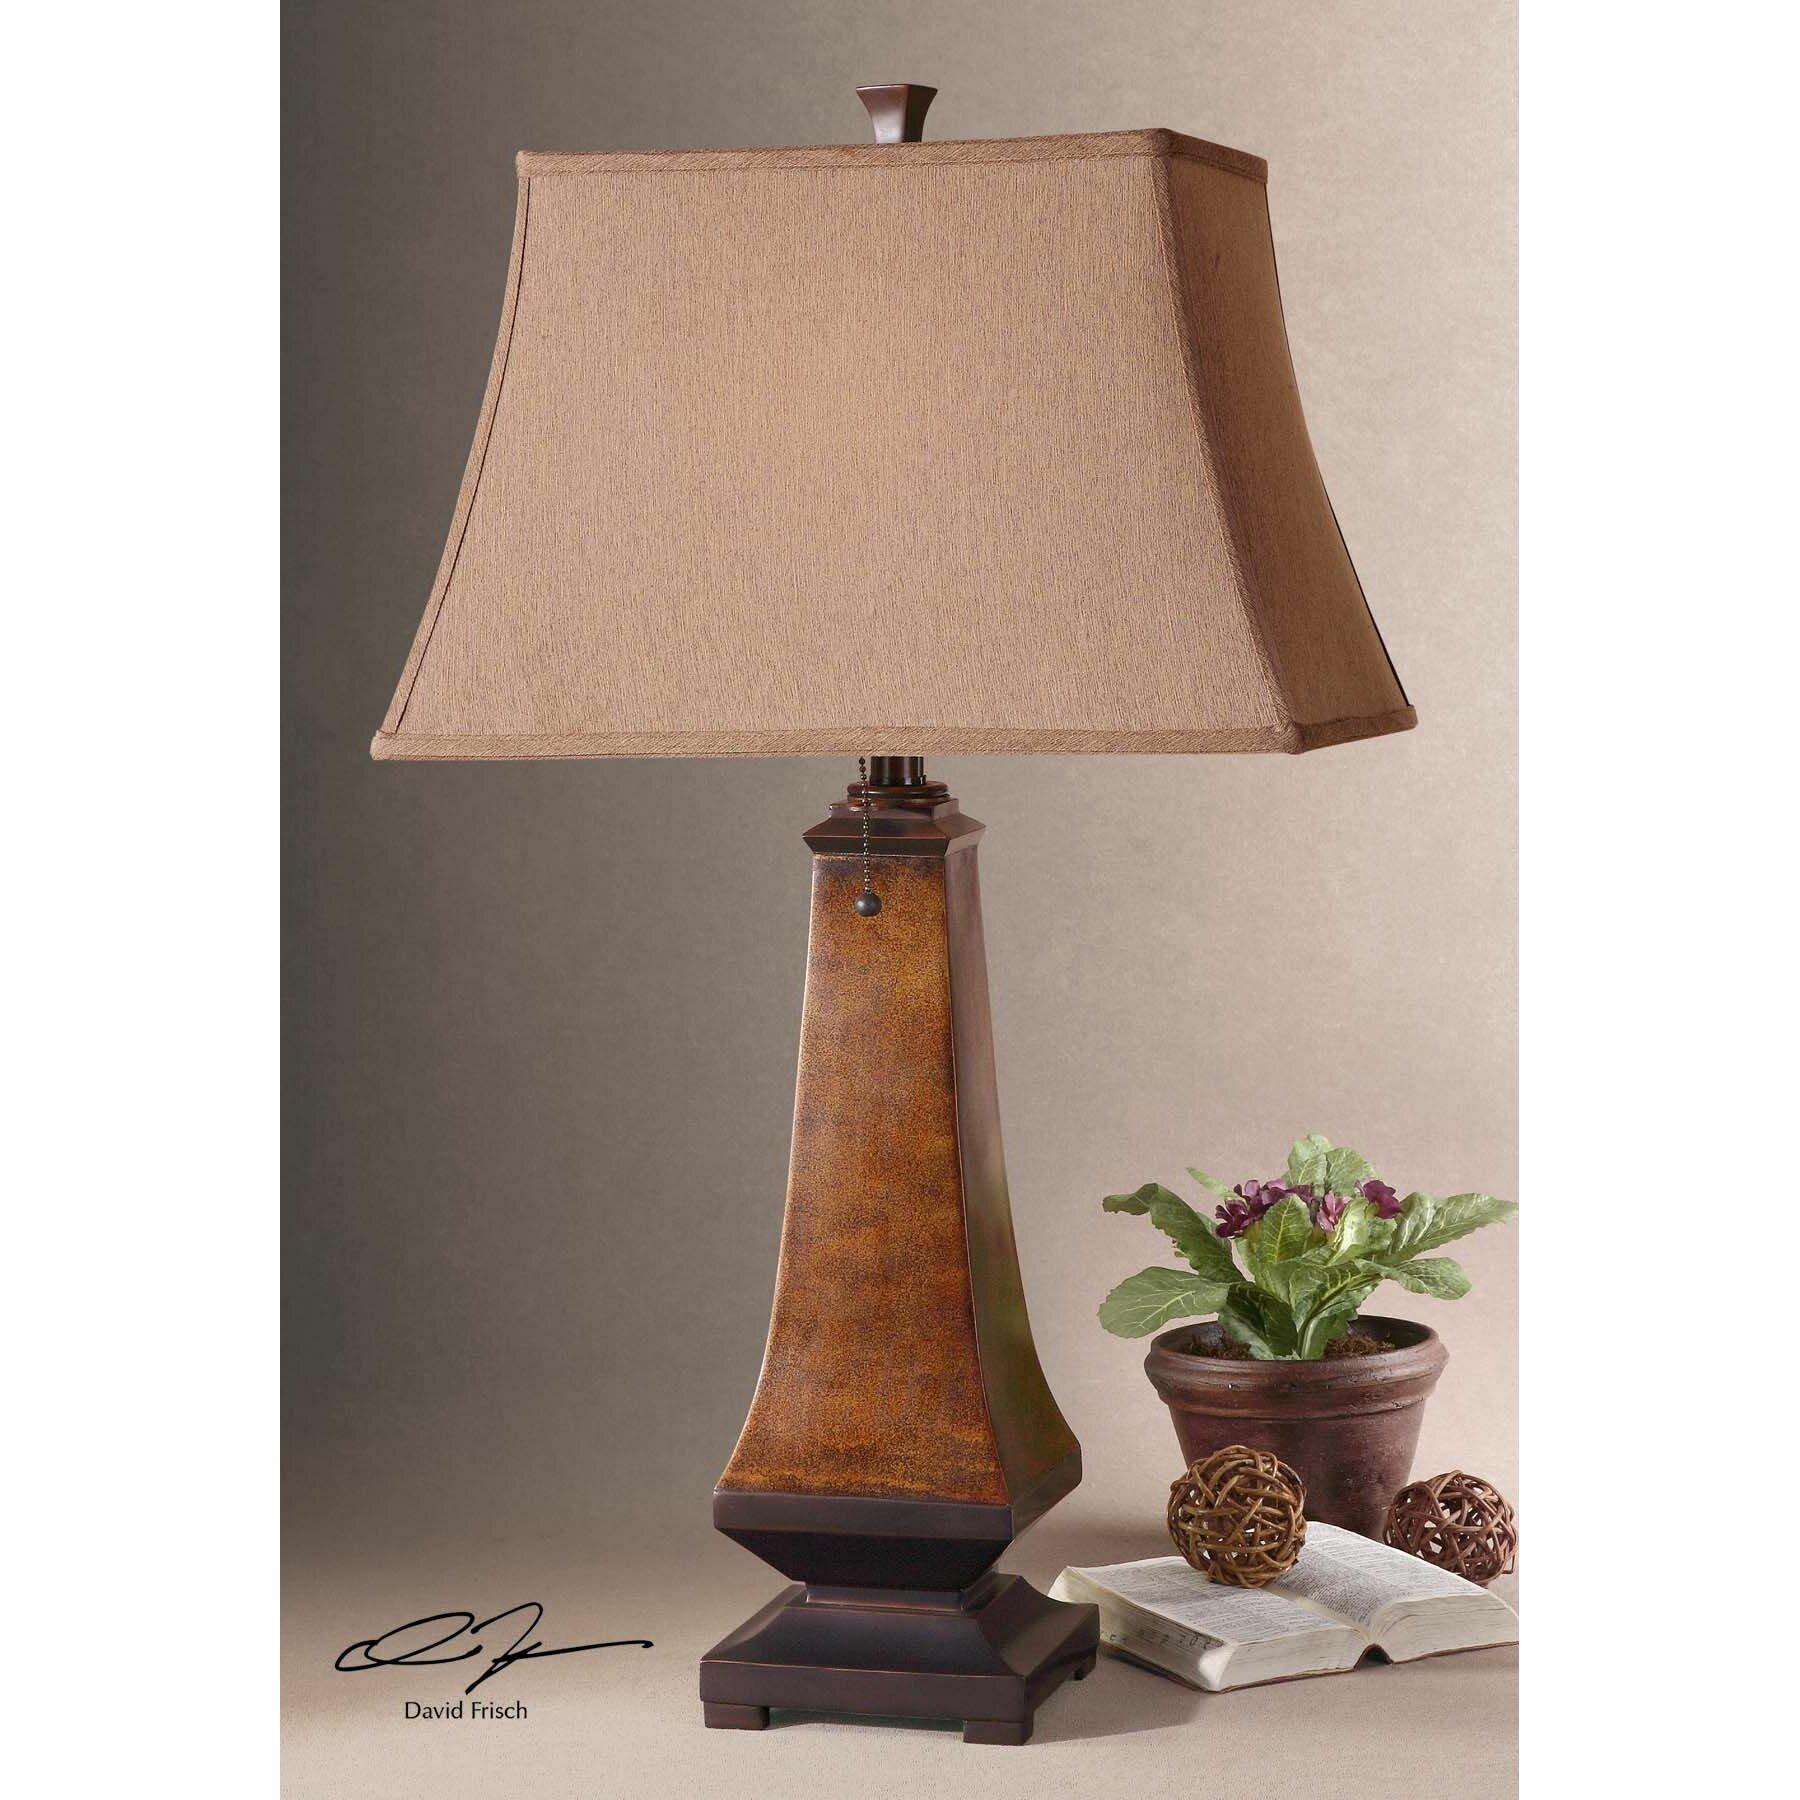 uttermost caldaro 30 table lamp reviews wayfair. Black Bedroom Furniture Sets. Home Design Ideas